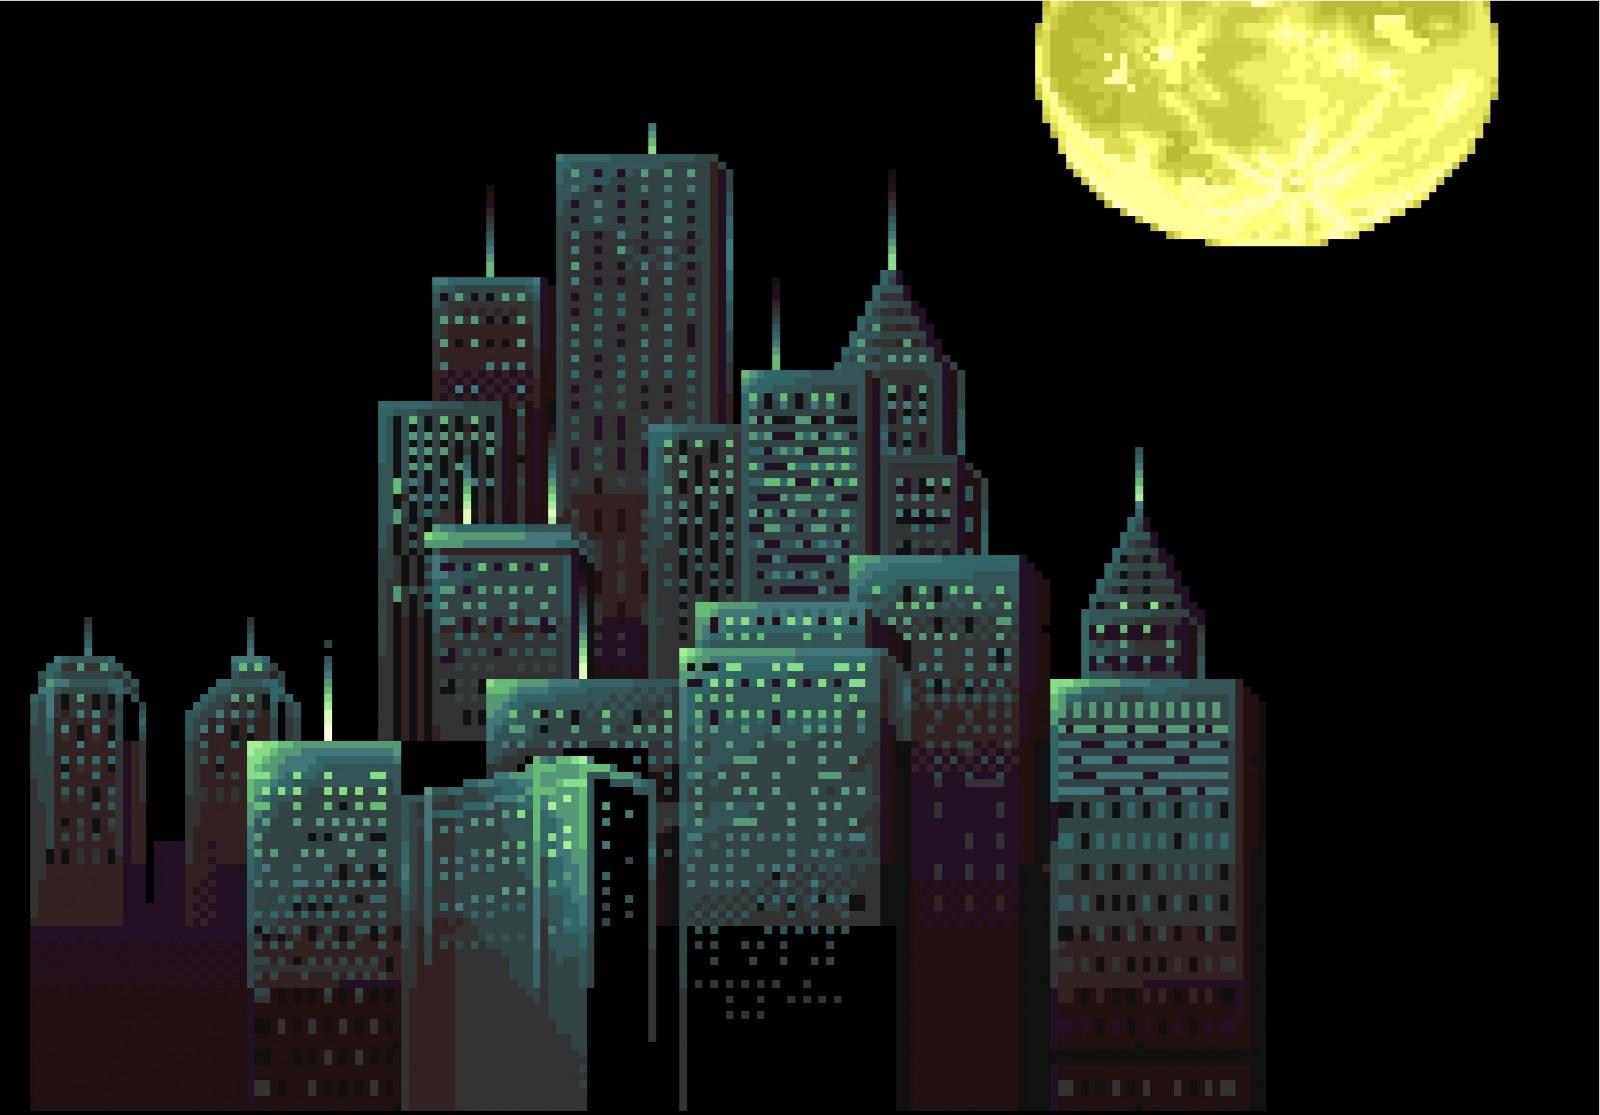 fond d 39 cran illustration fond noir ville paysage urbain nuit pixel art b timent texte. Black Bedroom Furniture Sets. Home Design Ideas